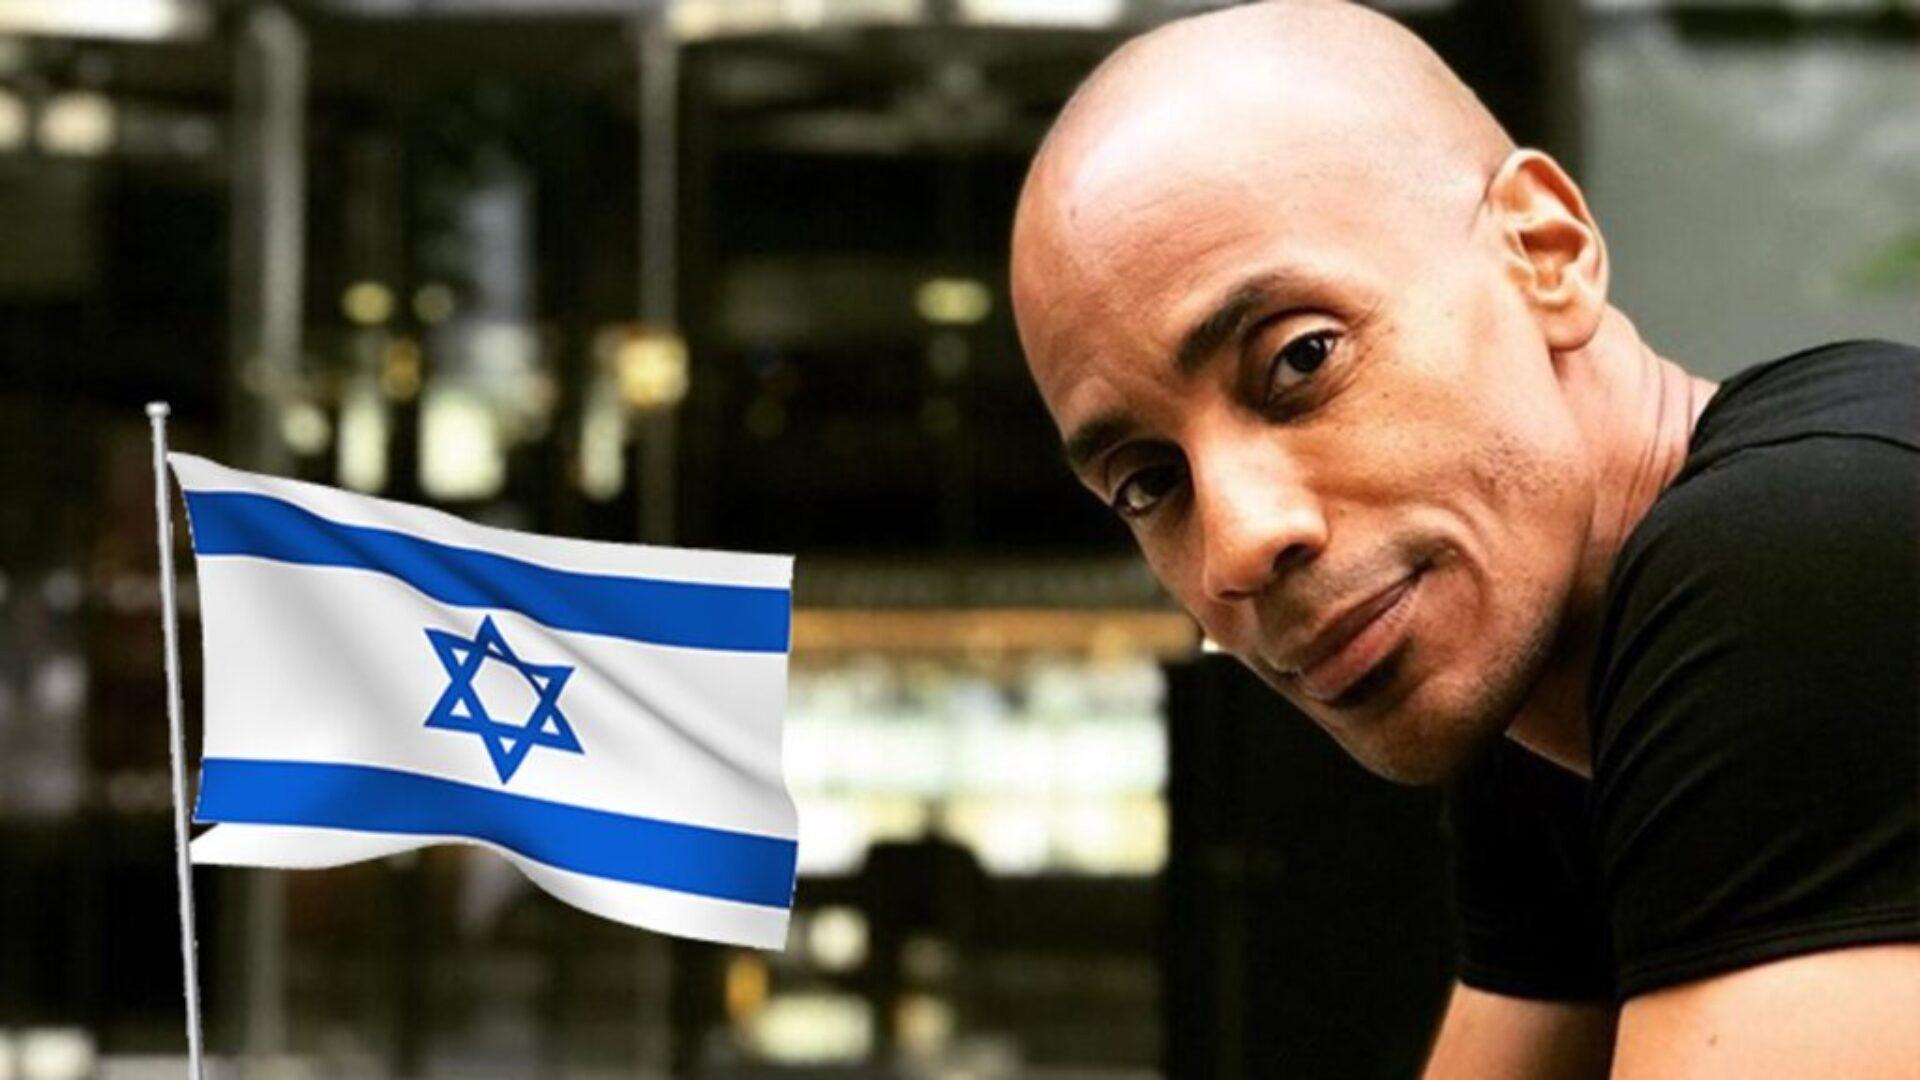 Google Exec has left position after 2007 blog post slamming state of Israel